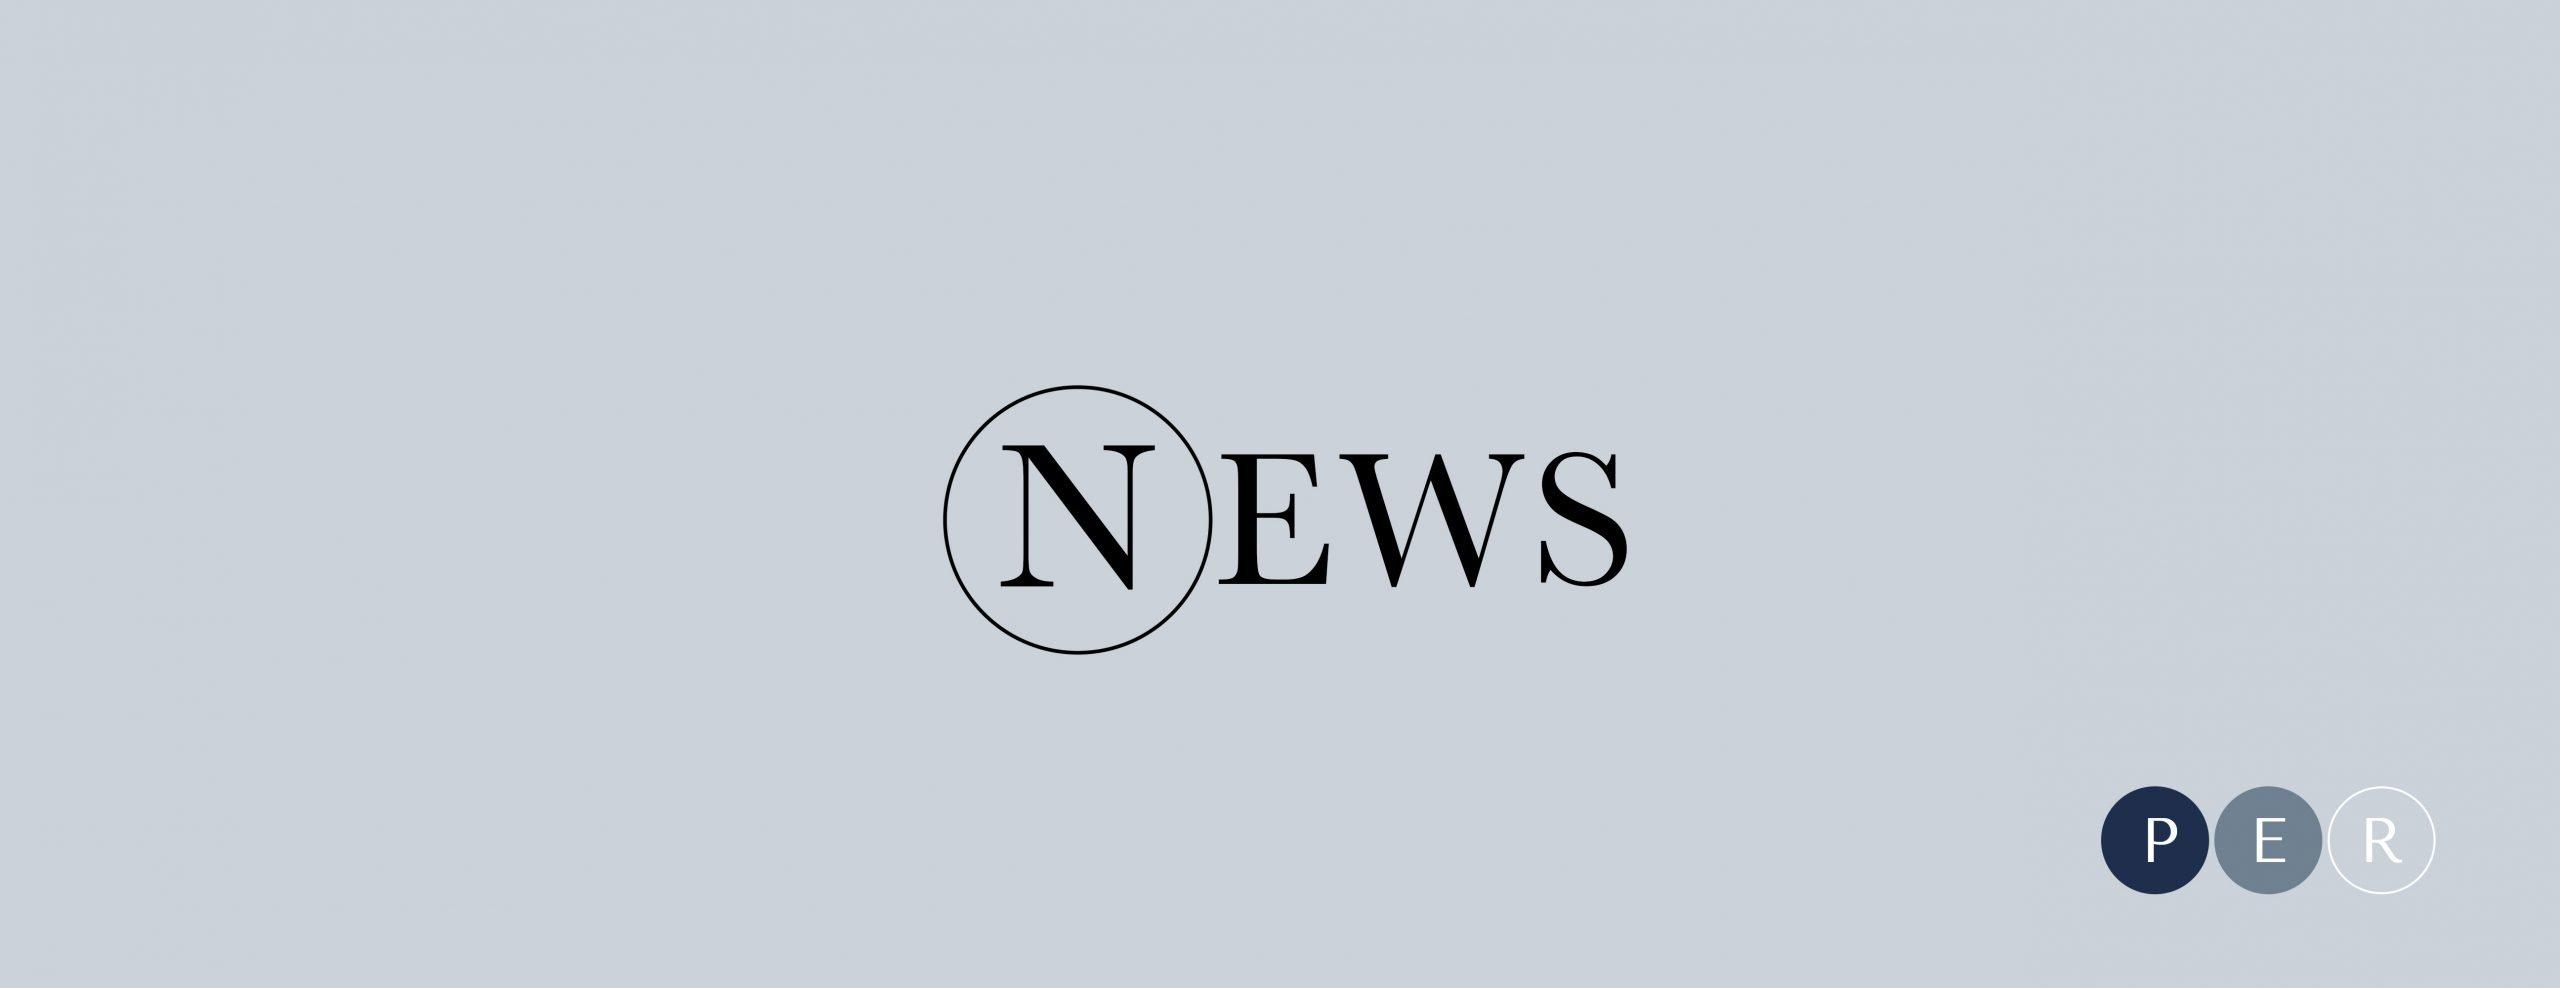 News - law firm - studio legale Perugia Avvocato Elton Qmemali